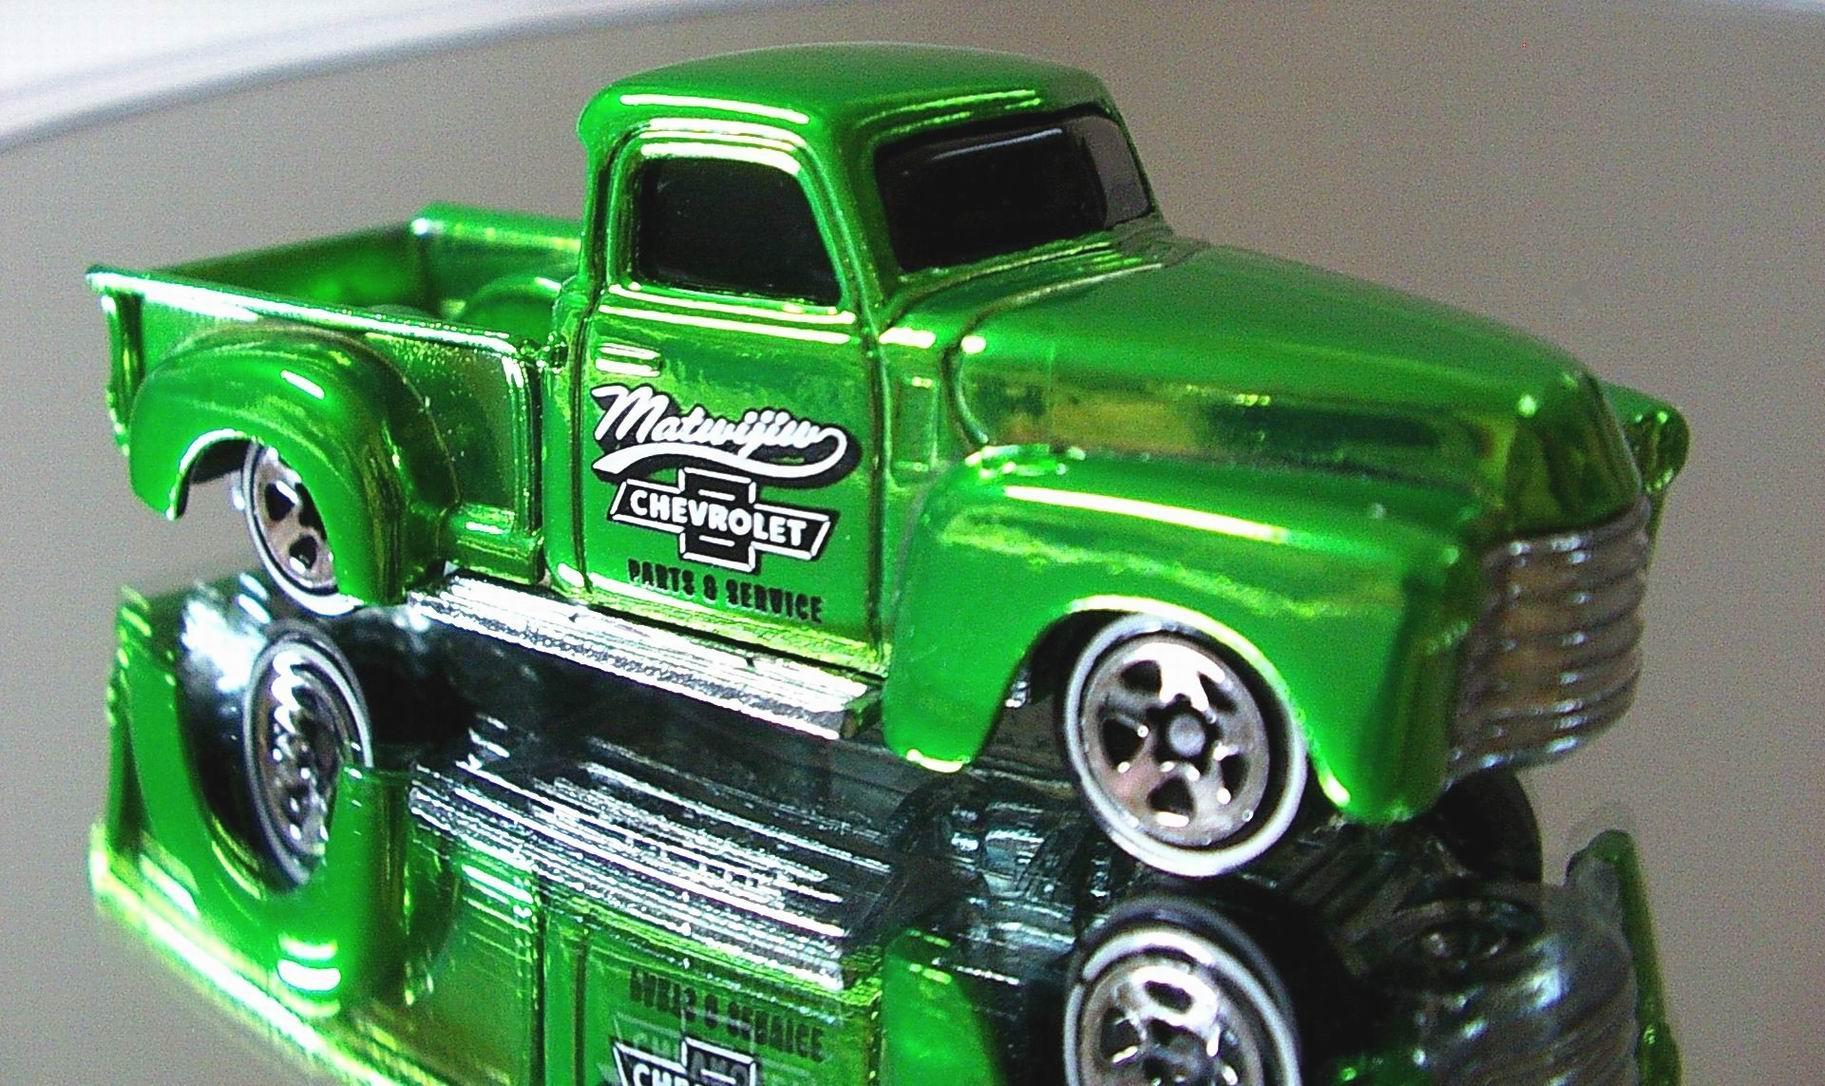 52 Chevy Truck Hot Wheels Wiki Fandom Powered By Wikia